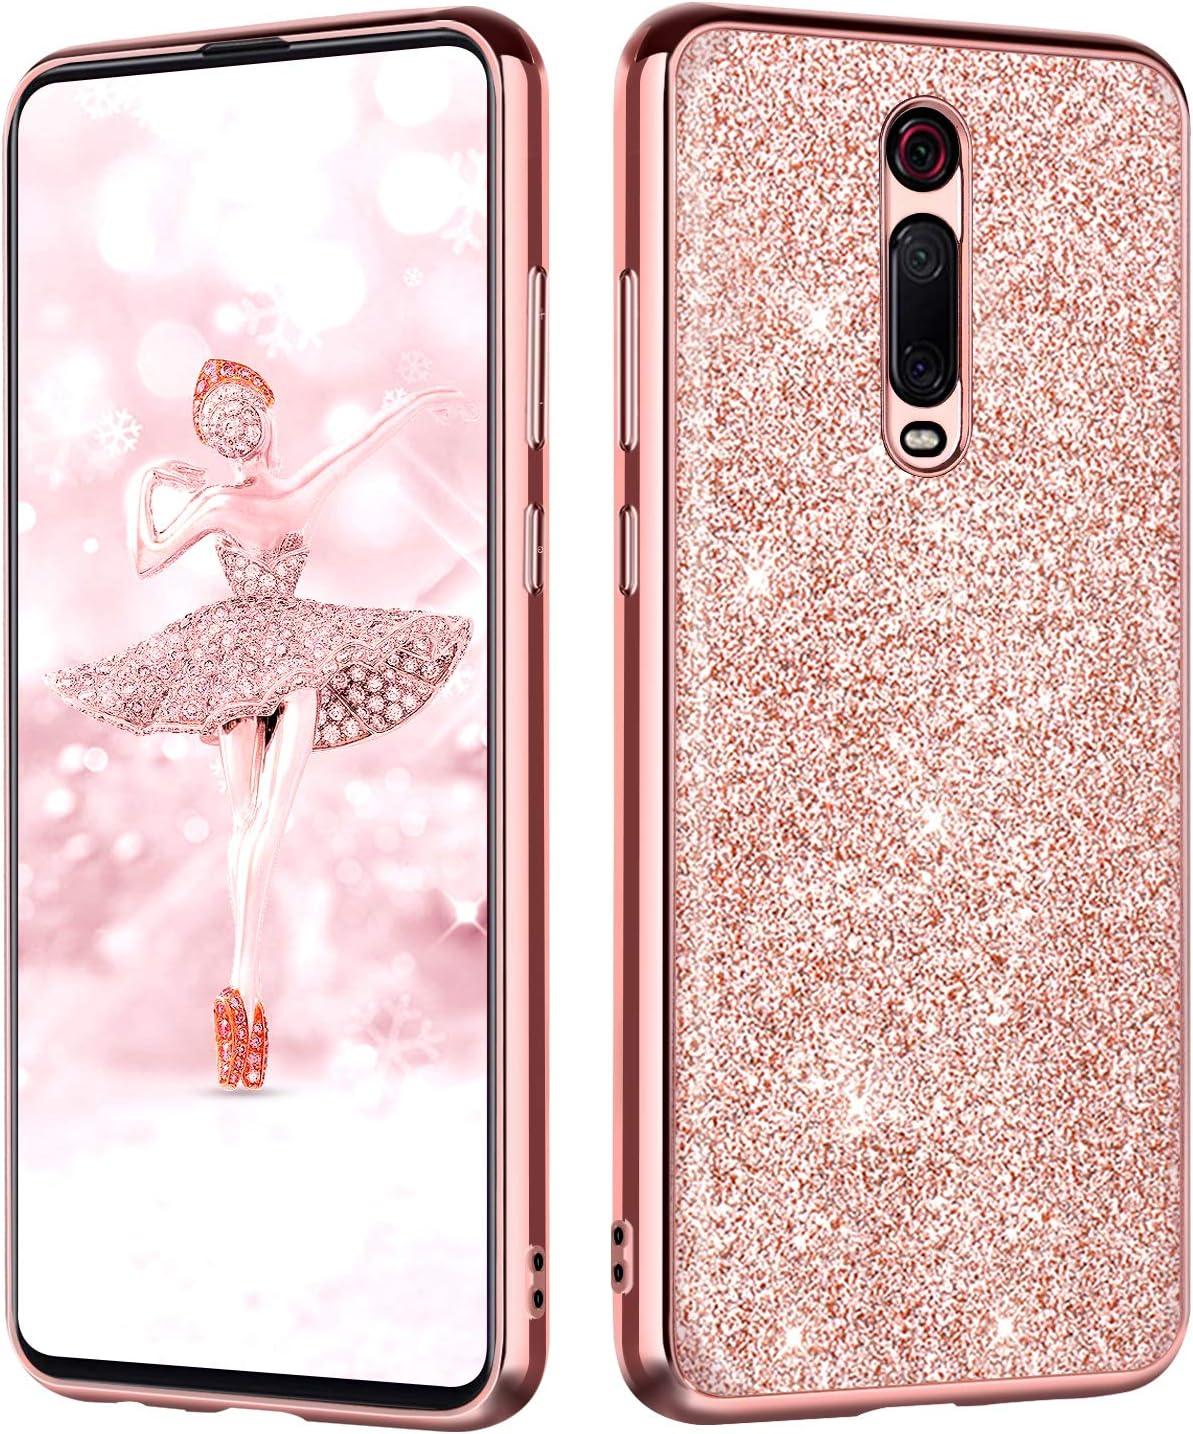 BENTOBEN Funda Xiaomi Mi 9T/Xiaomi 9T Pro Purpurina Carcasa Ultra Delgada Cover Case Brillante Resistente Suave Silicona PC Protectora a Prueba de Golpes Fundas para Xiaomi Mi 9T 6.39'', Oro Rosa